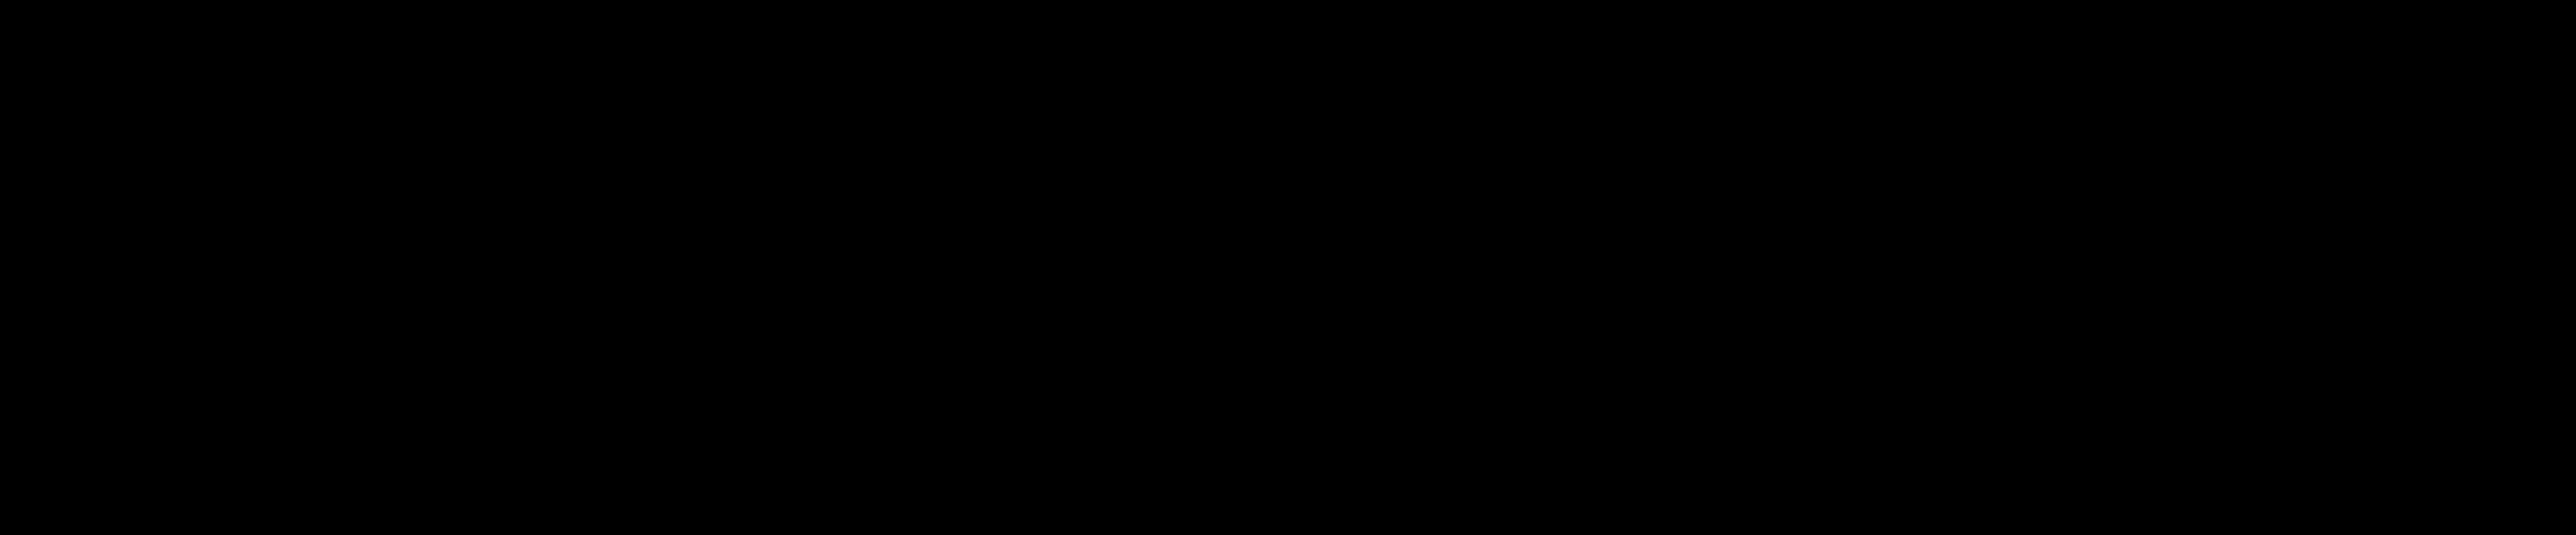 Roedale Webshop-Logo